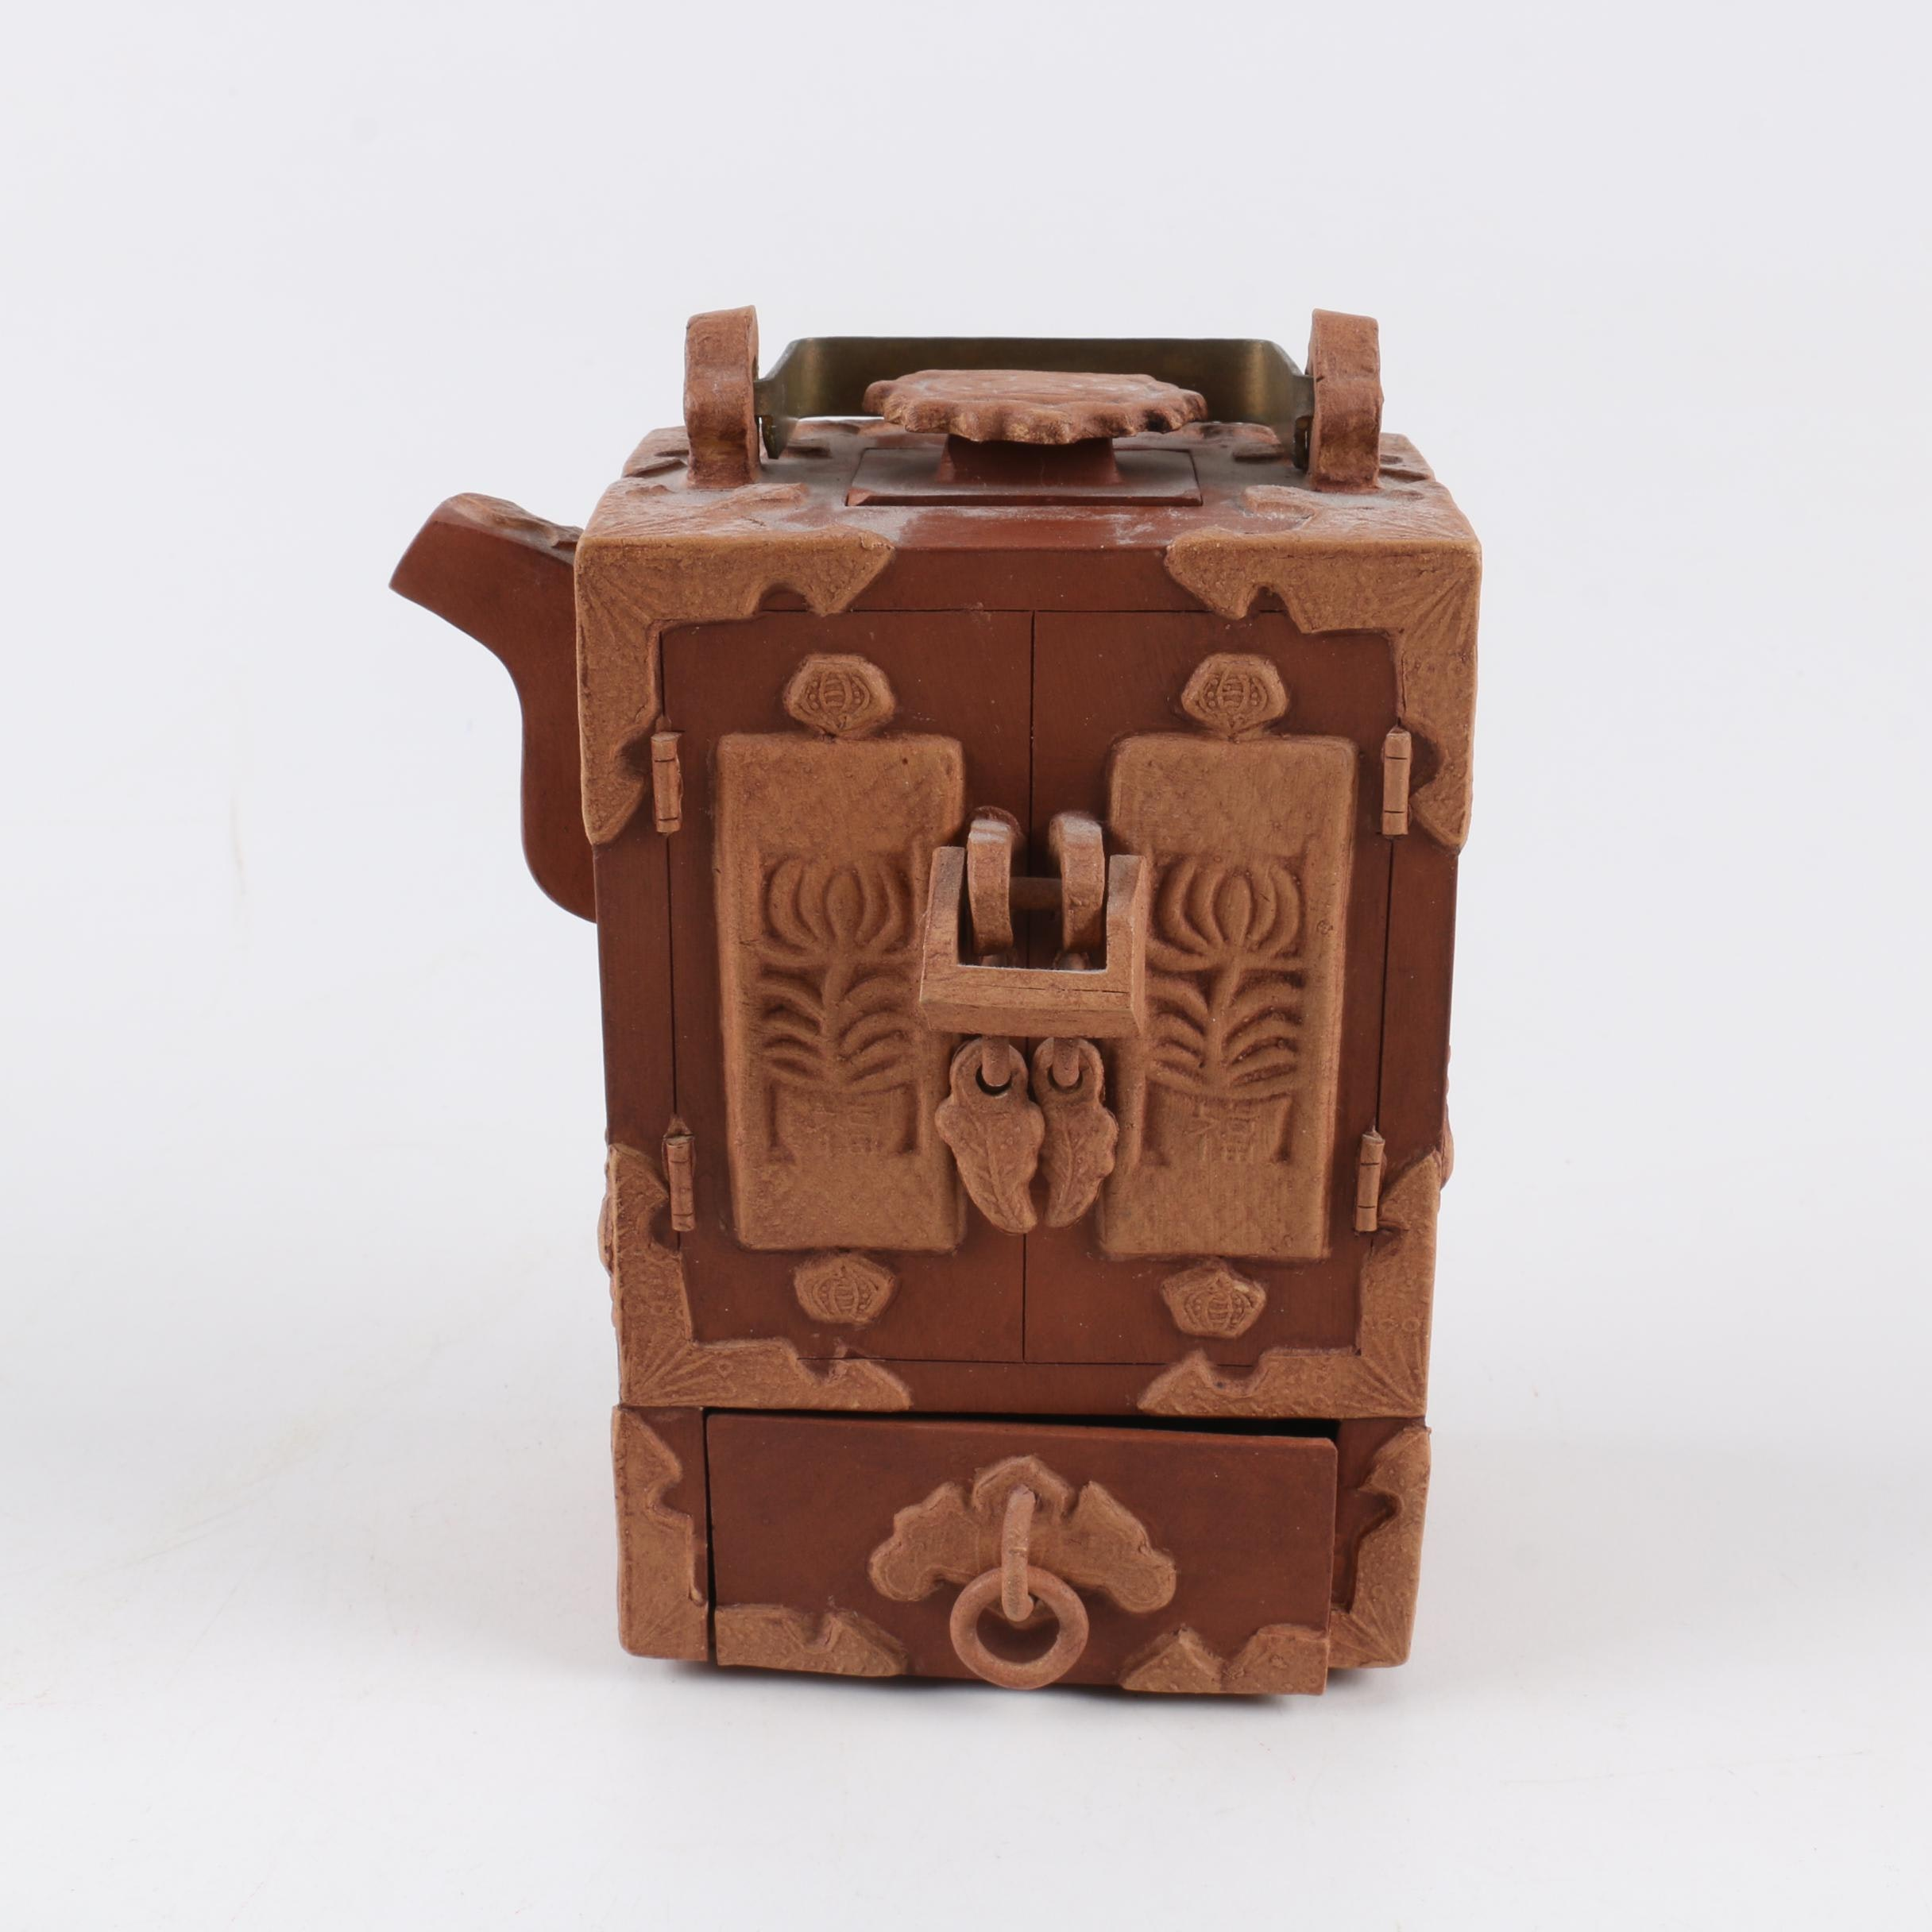 Chinese Handbuilt Redware Cabinet Teapot